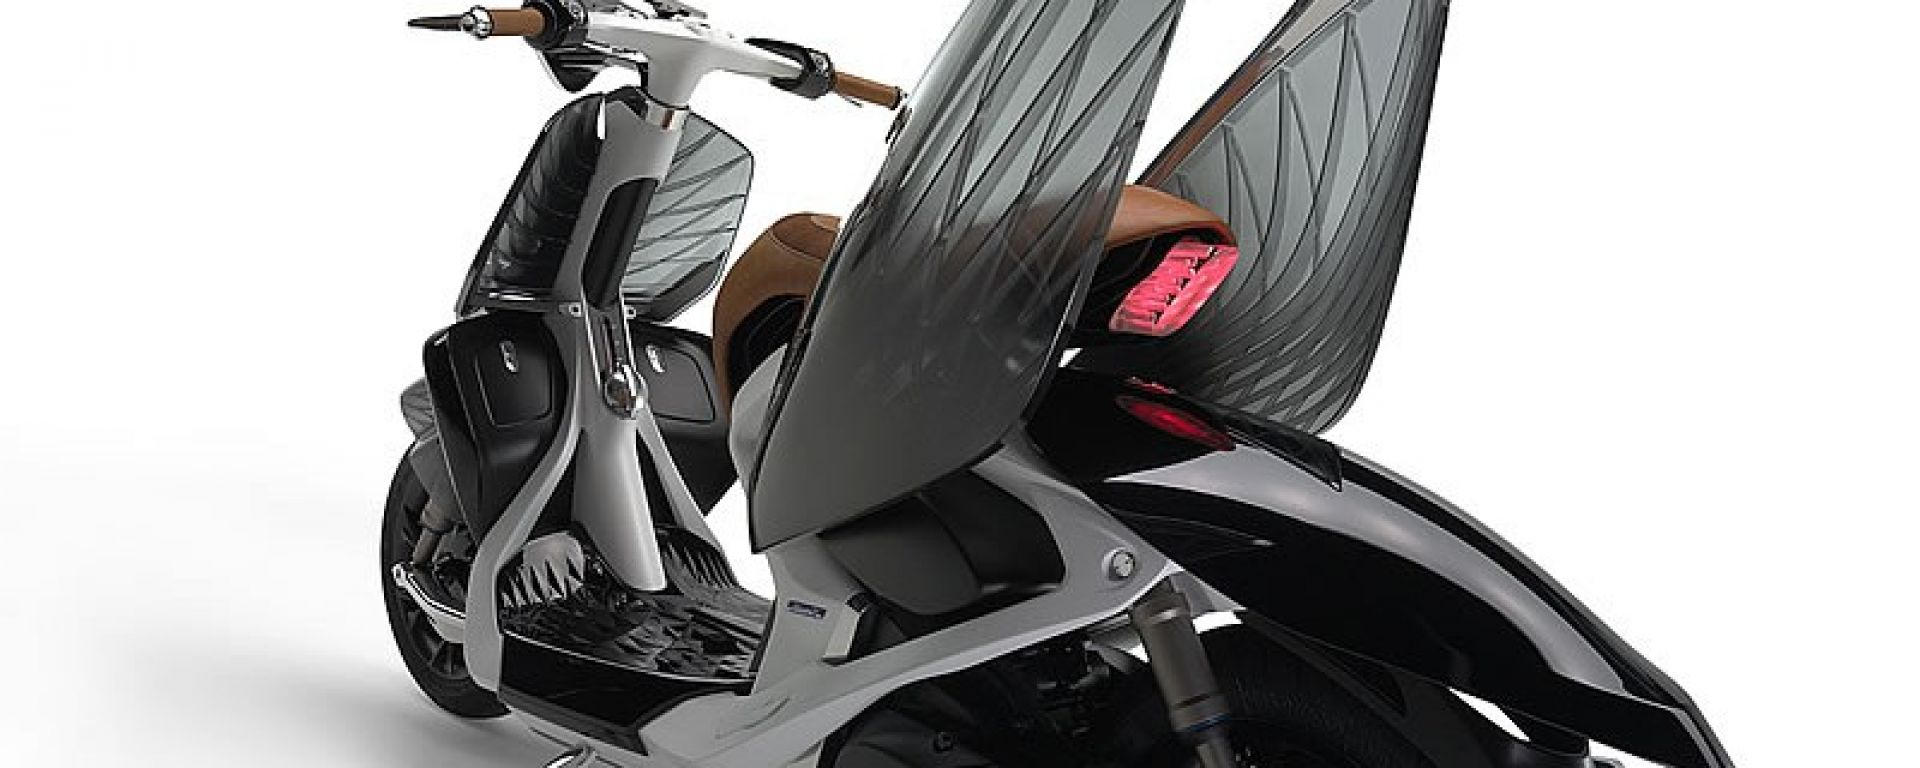 Yamaha 04GEN, lo scooter venuto dal futuro